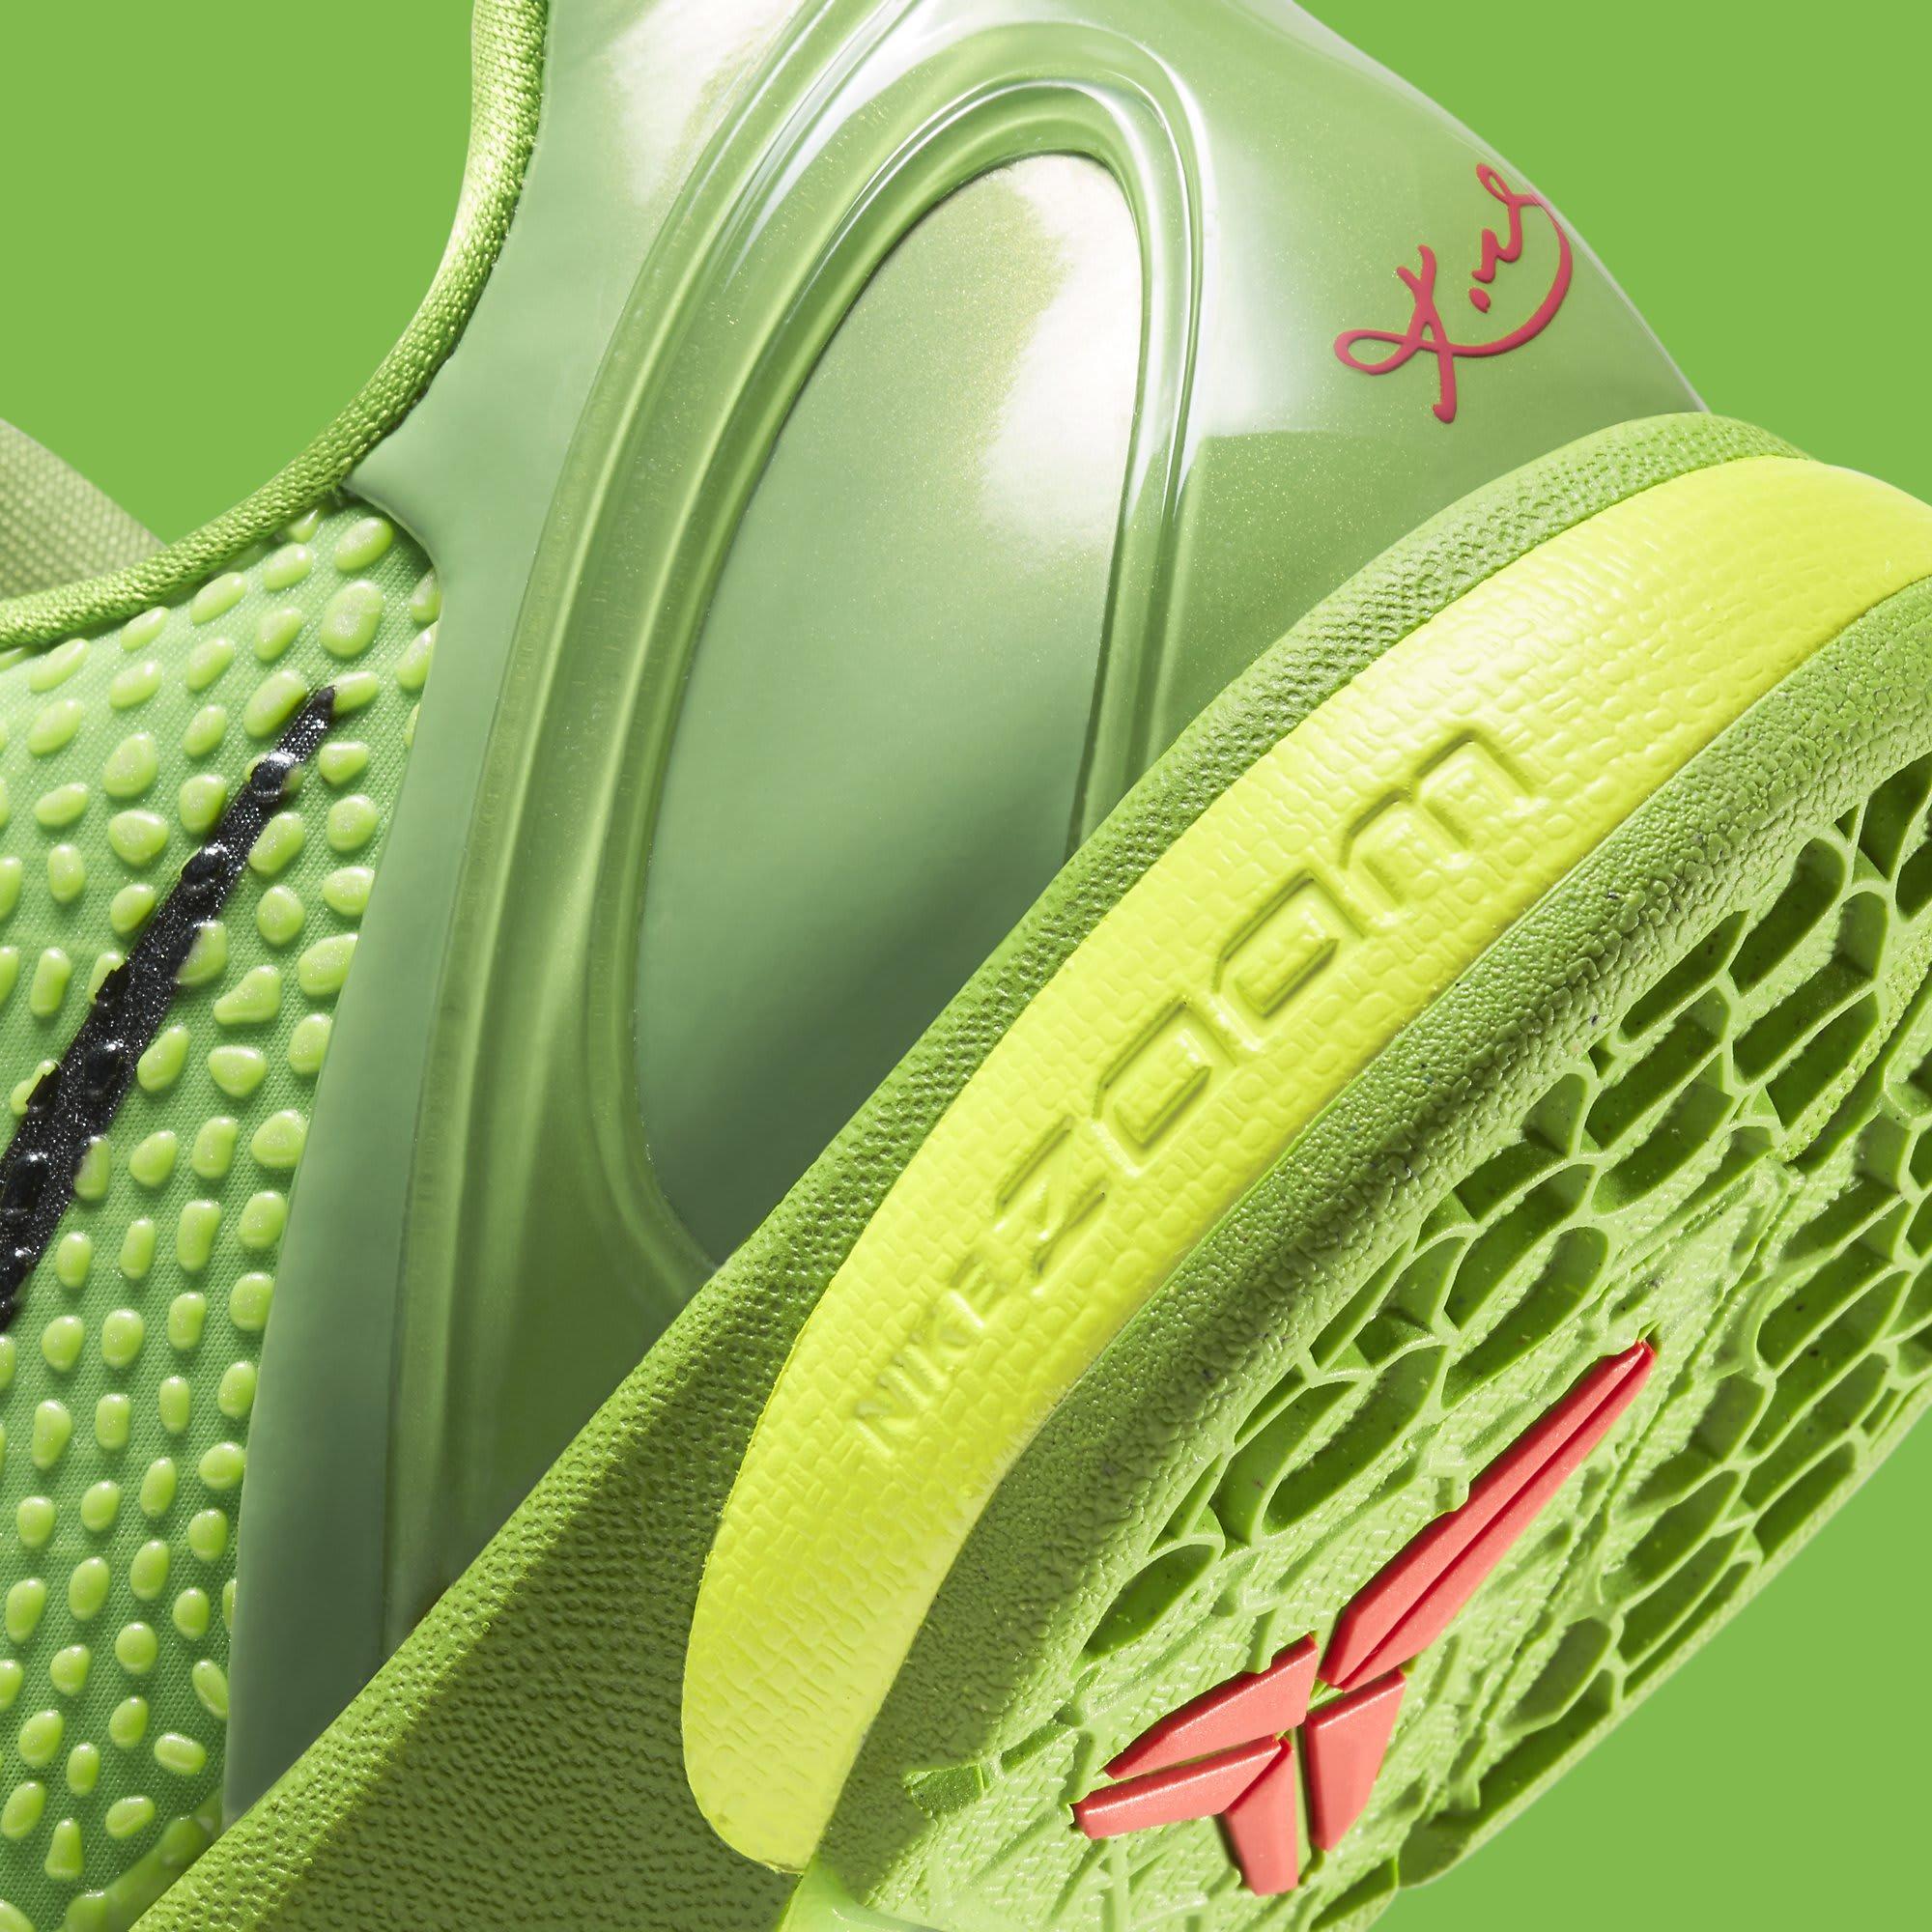 Nike Kobe 6 Protro 'Grinch' CW2190-300 Heel